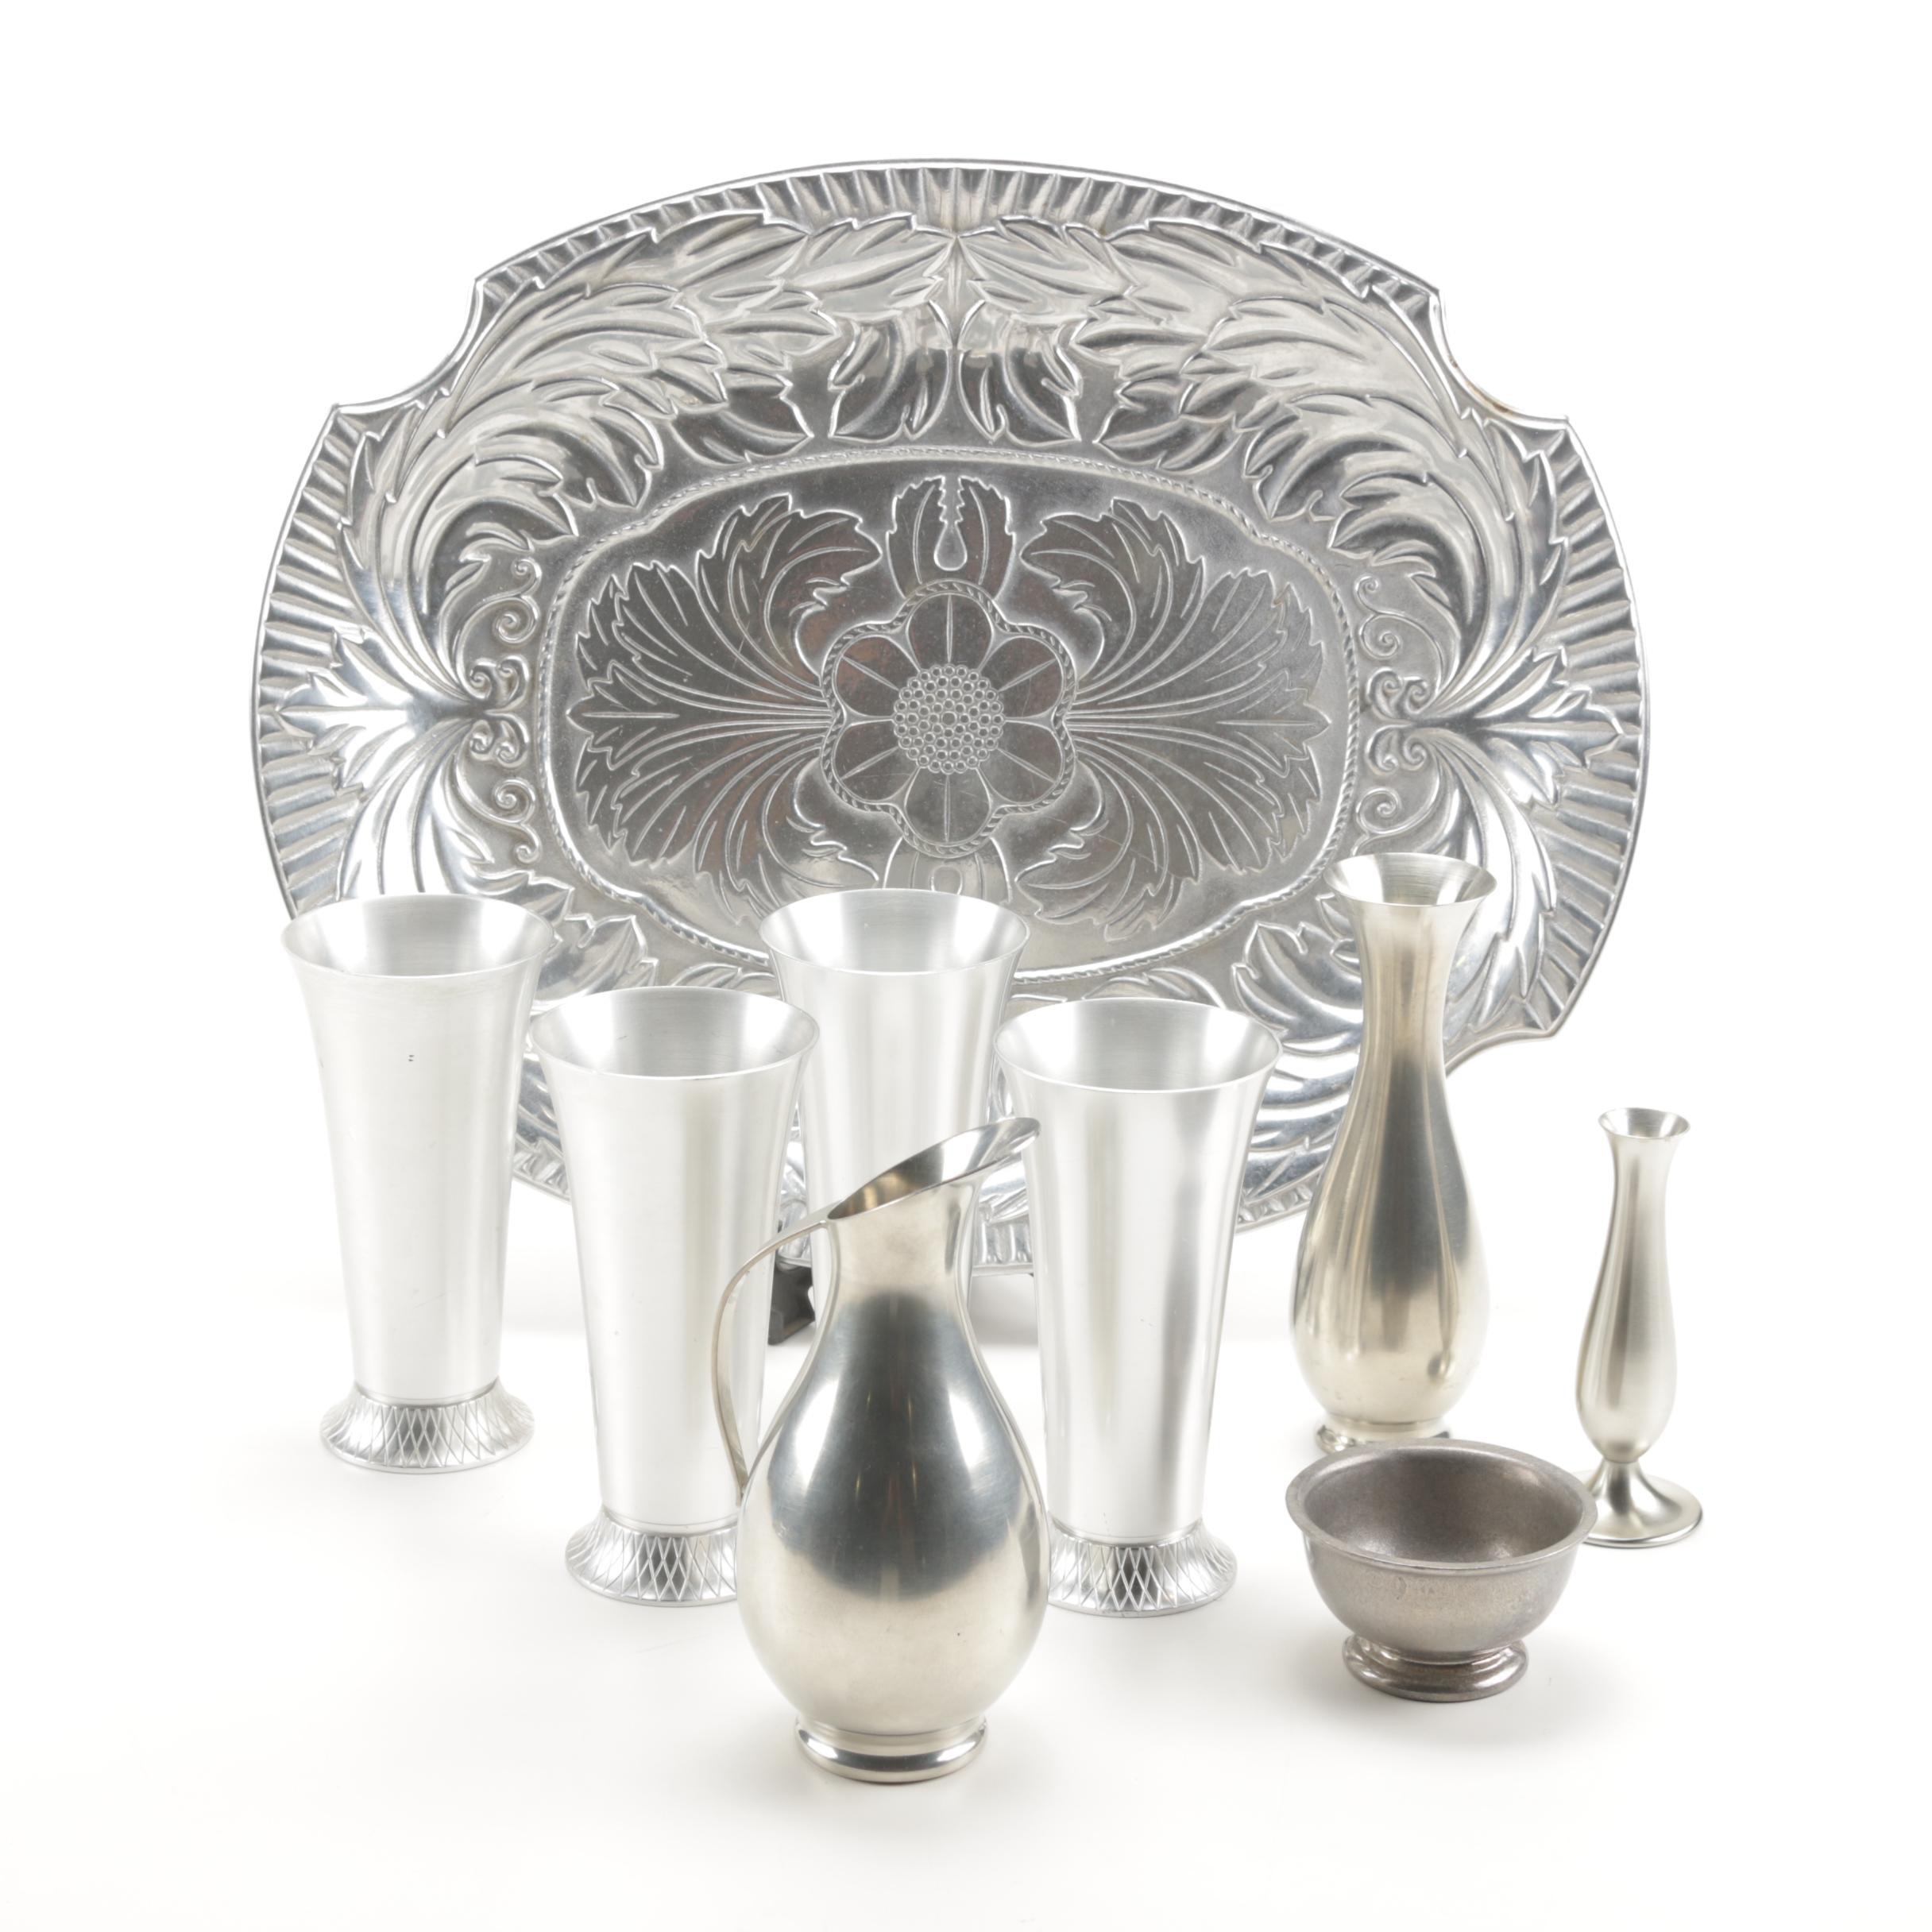 Aluminium and Pewter Serveware Featuring Wilton, Kensington, Daalderup